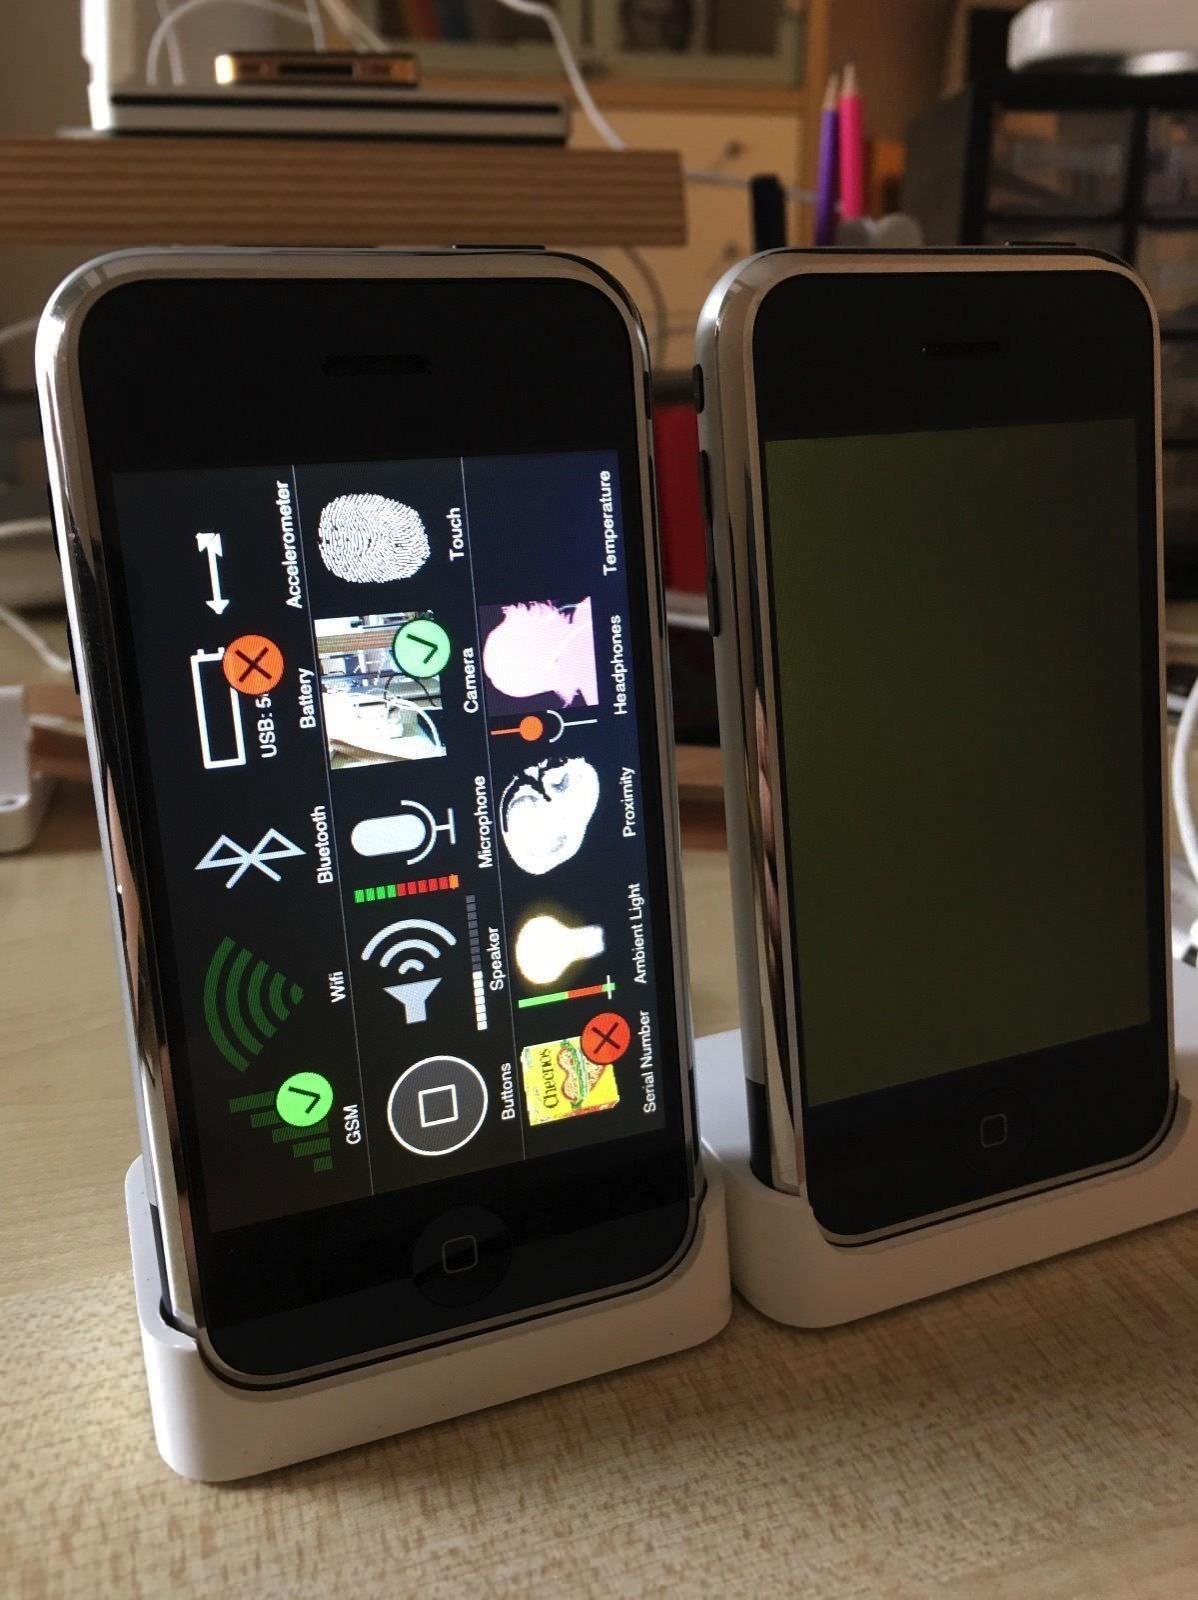 Prototype-Original-iPhone-on-ebay-7.jpg